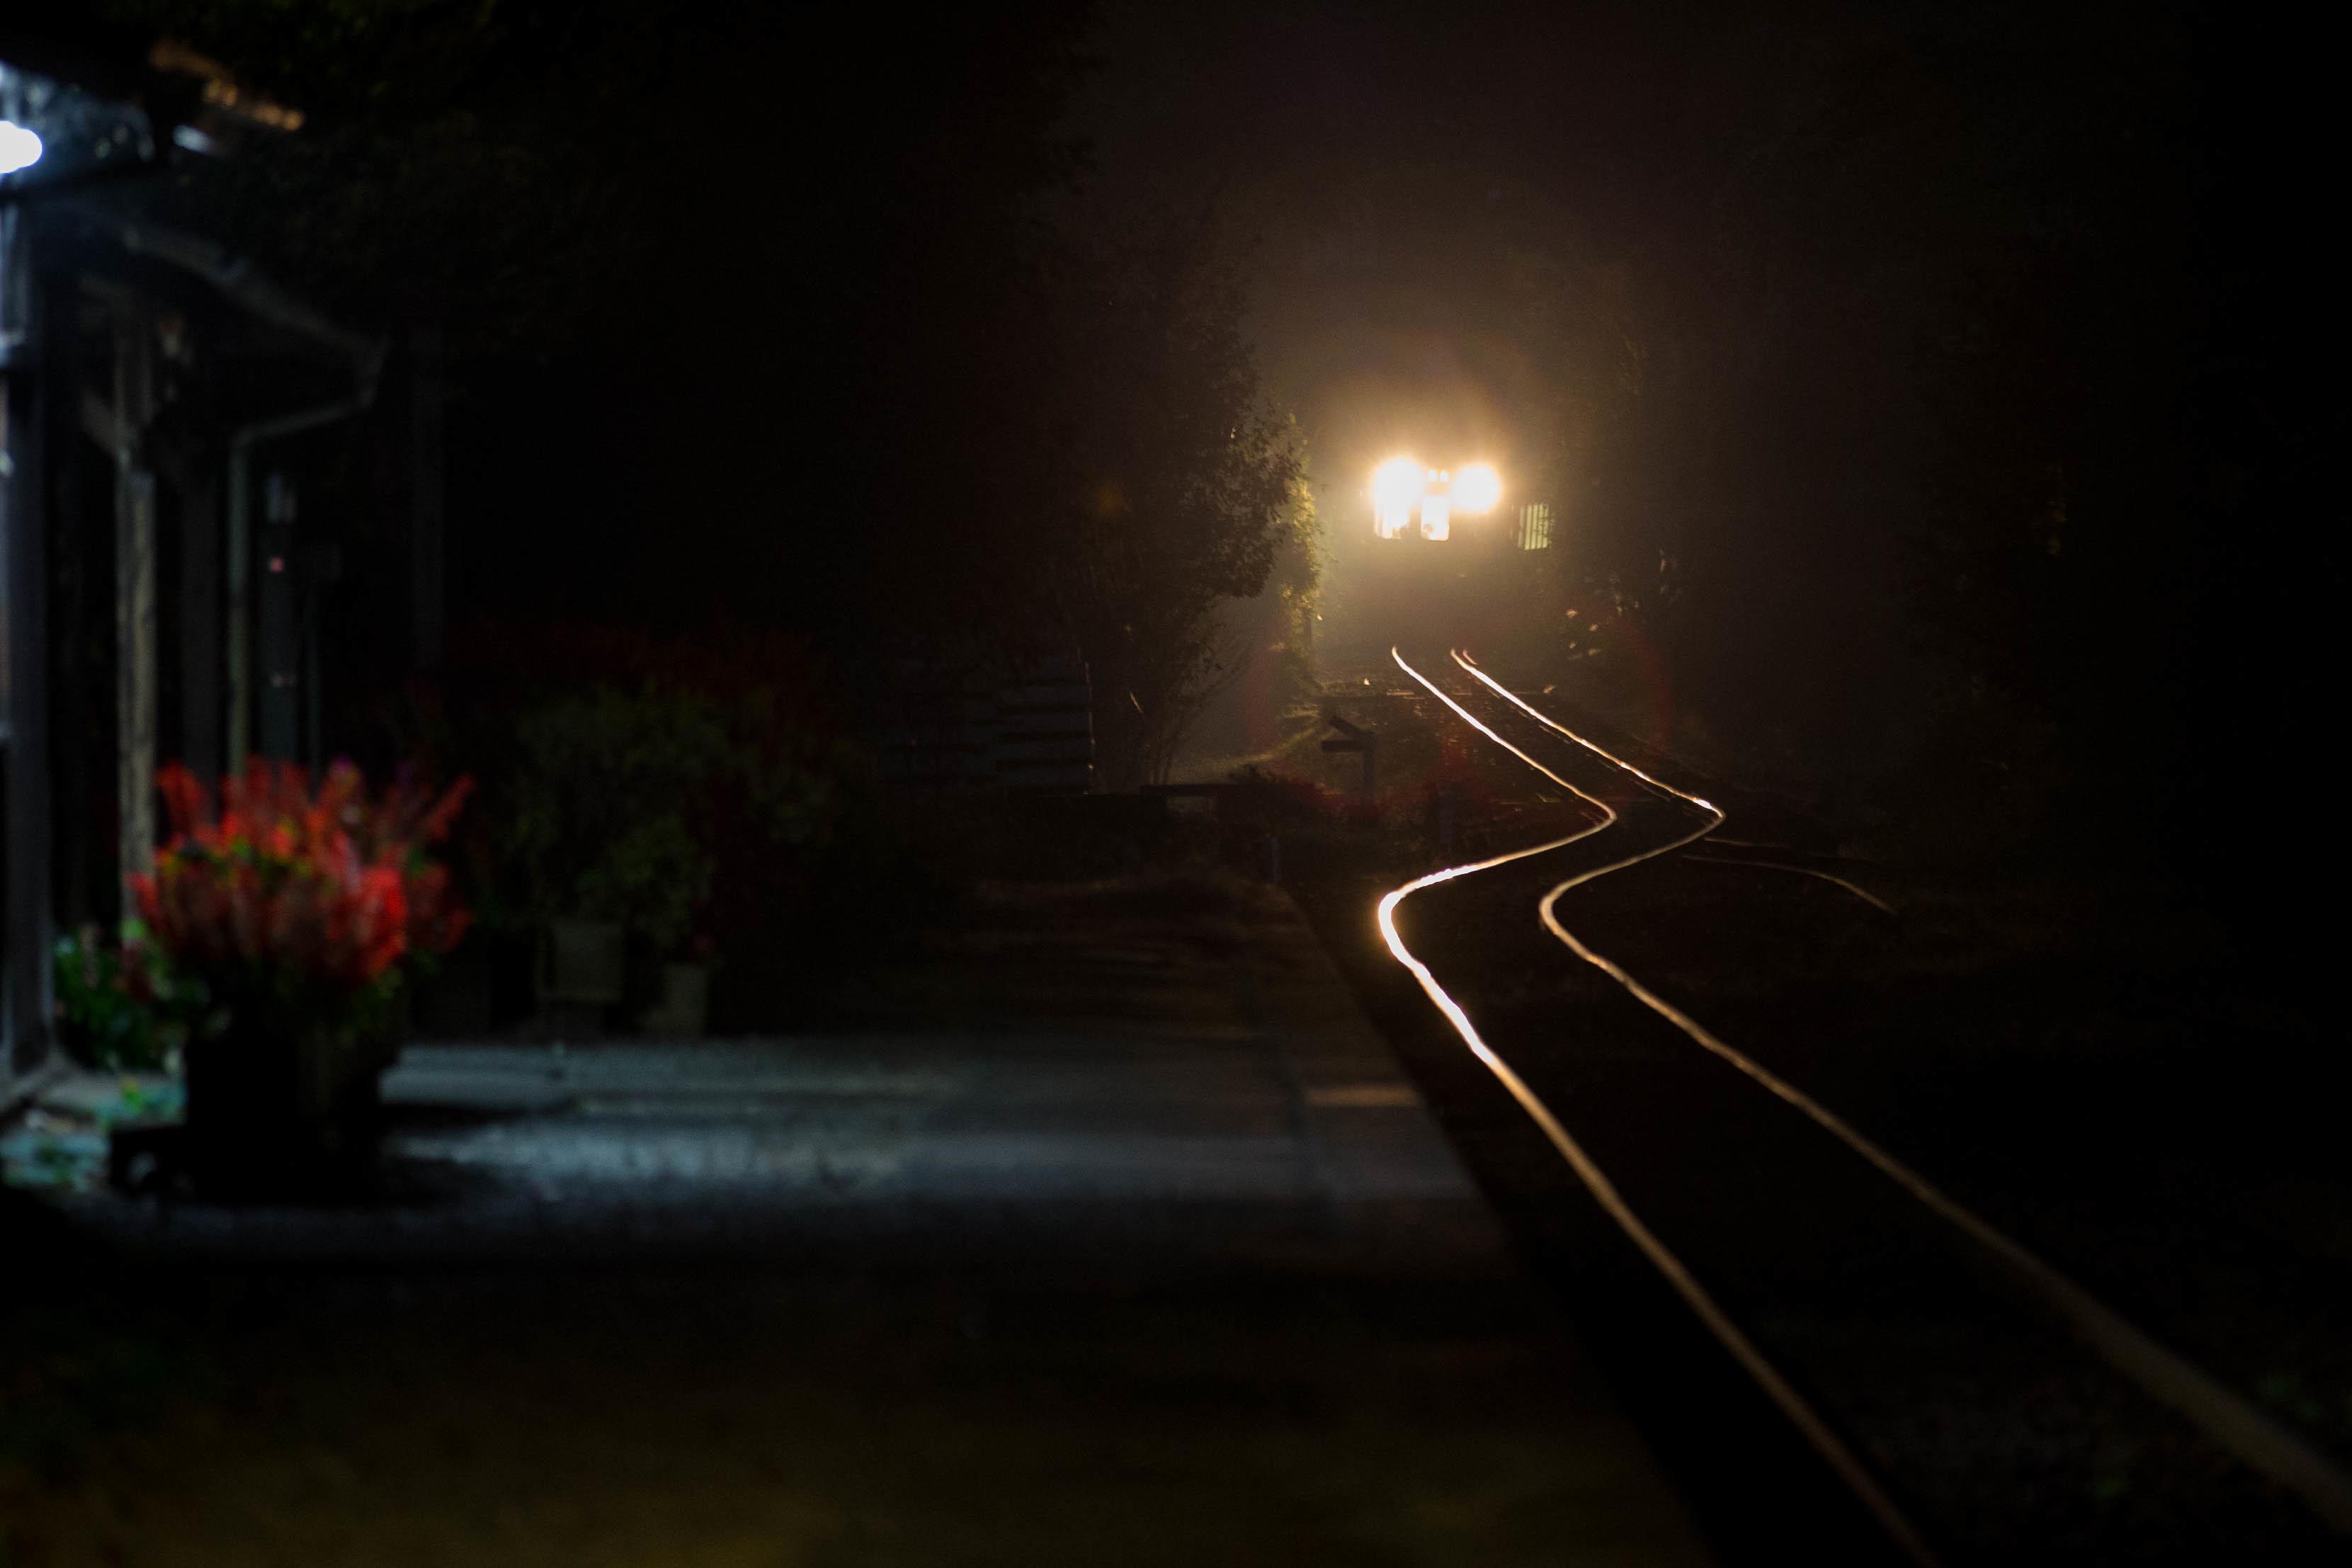 Train  ・・・夜感鉄道もどき・・・_f0333031_09143179.jpg